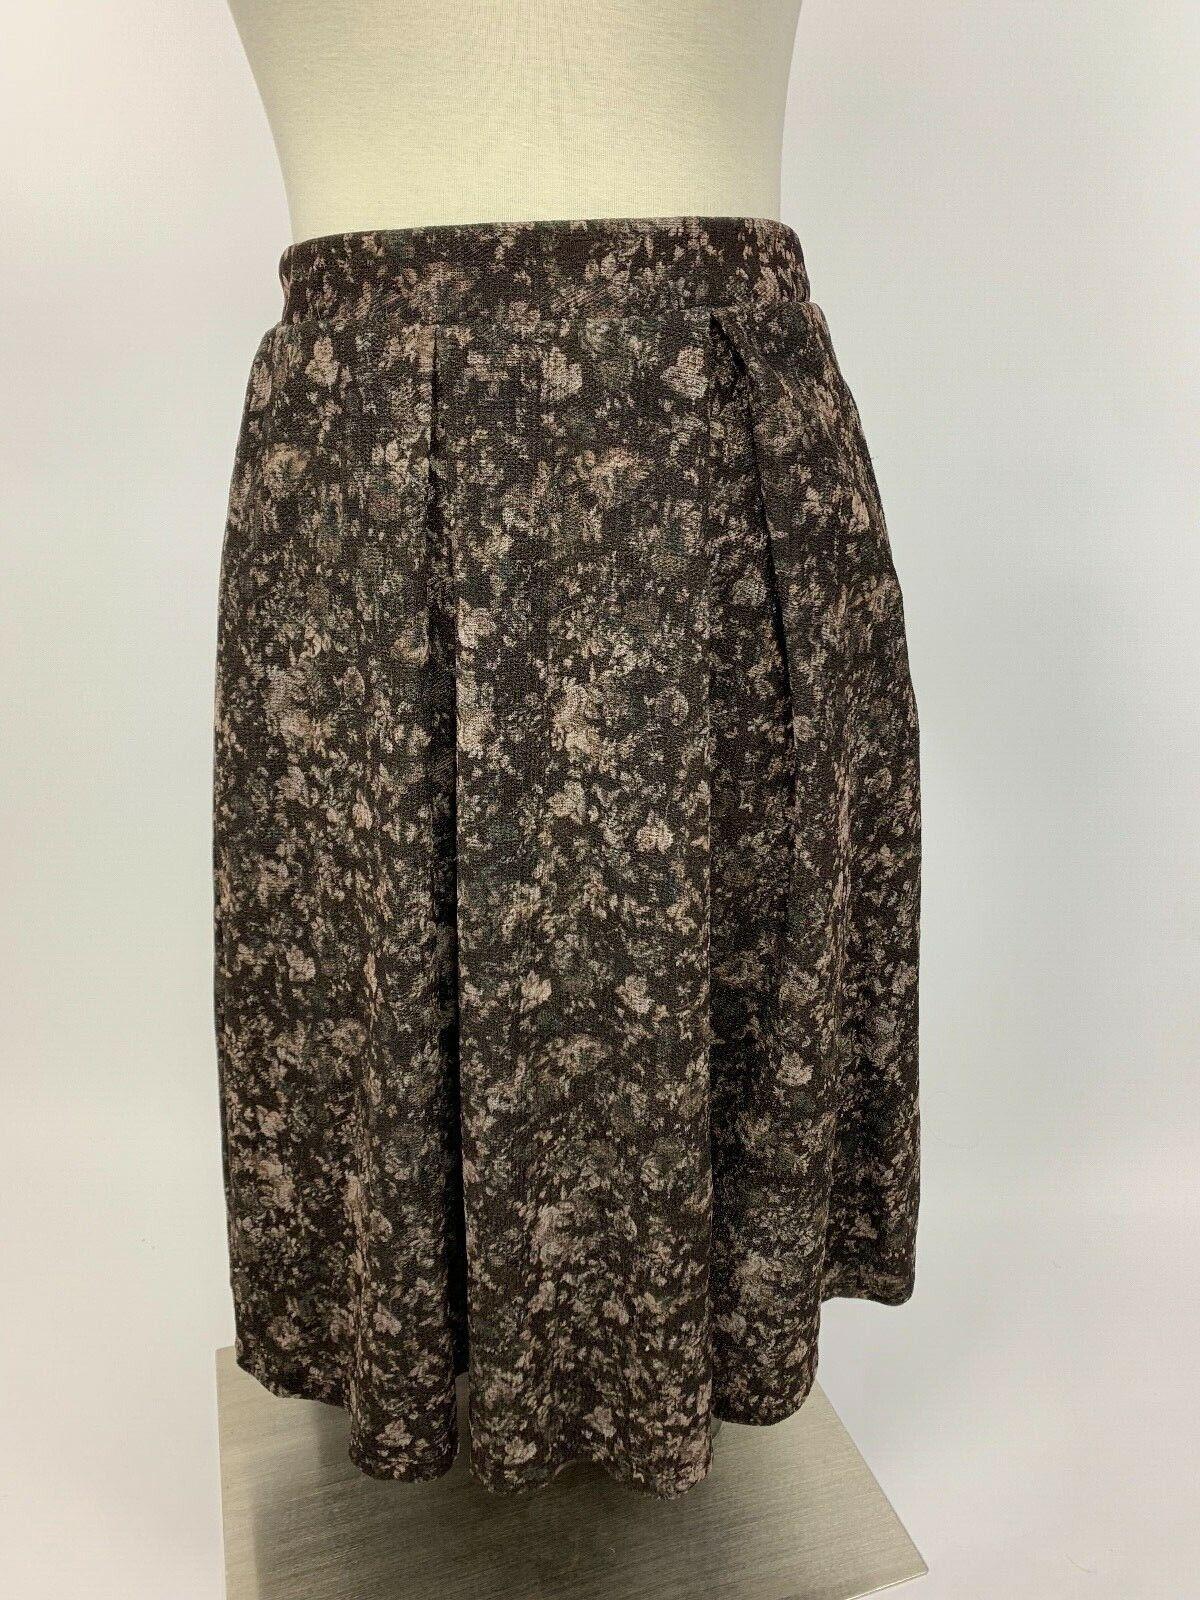 LulaRoe Brown Sepia Vintage Floral Madison Pleated Stretch Skirt Large Nice